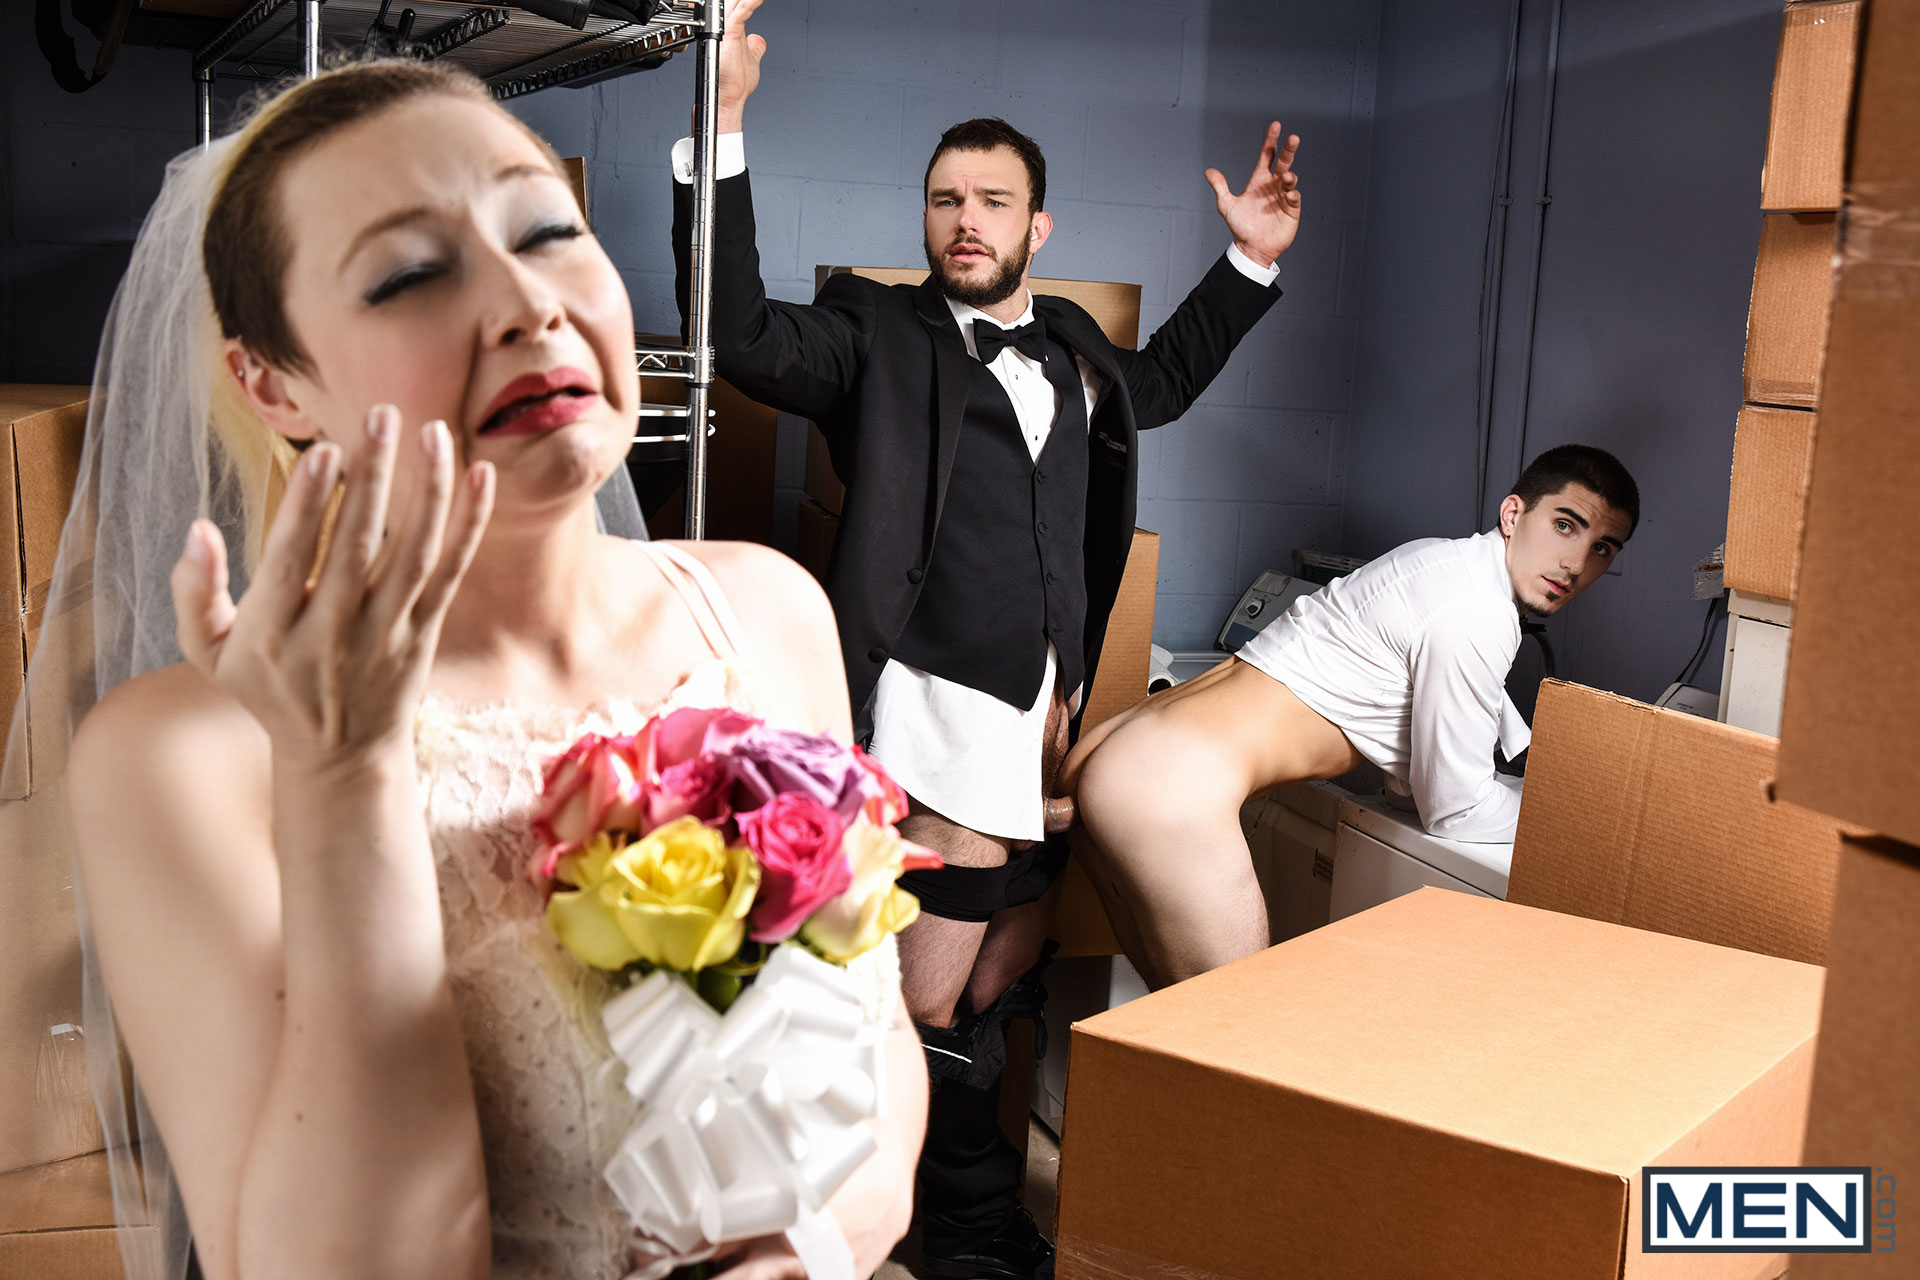 Dean matty swingers Fever parties, fever-Review-Cosmopolitan